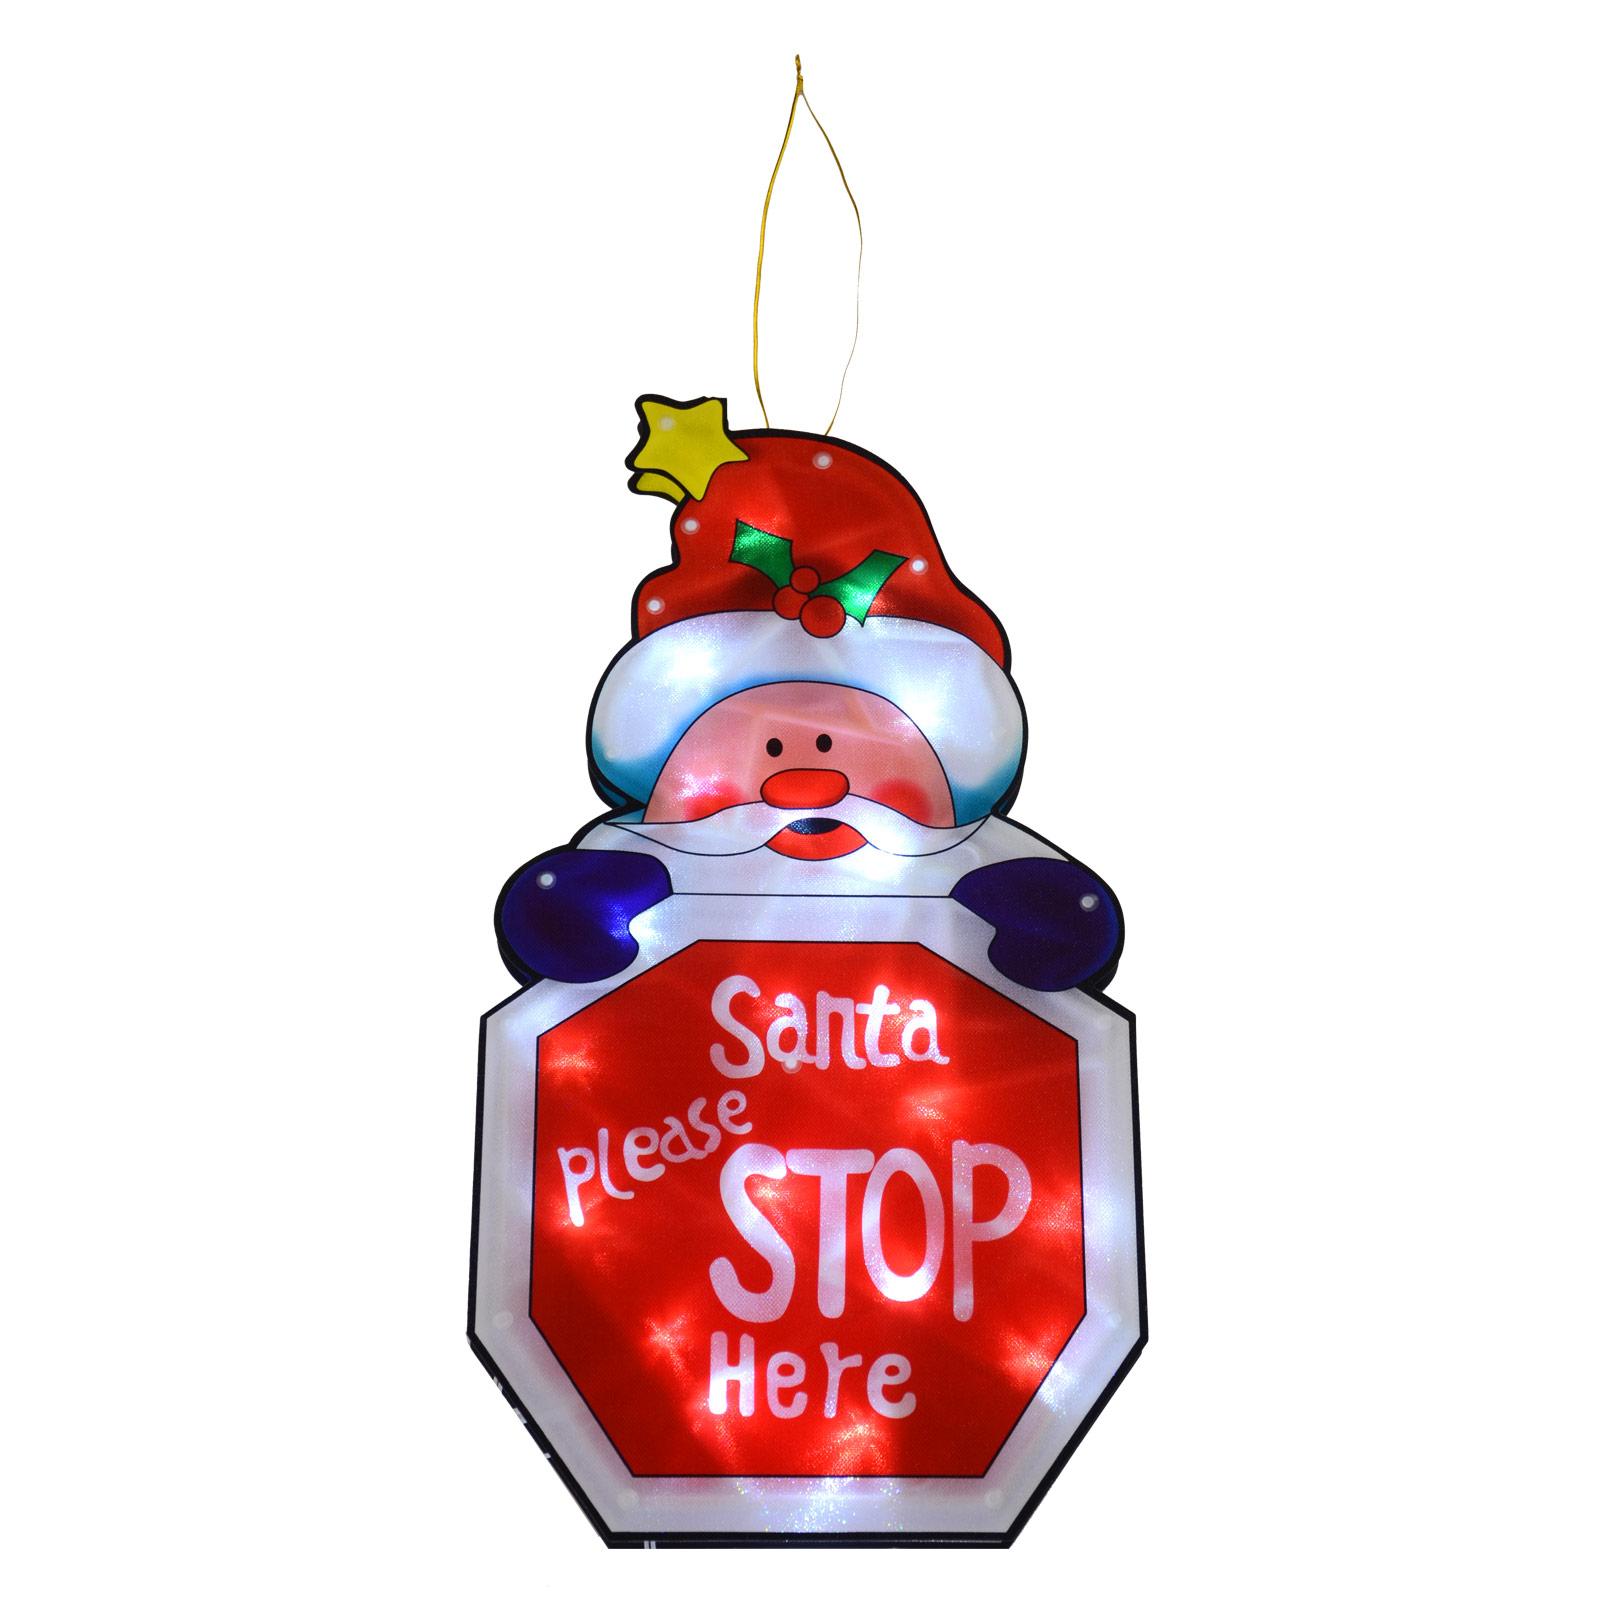 Light Up Santa Stop Here Decoration Battery LED Window Silhouette Christmas 45cm